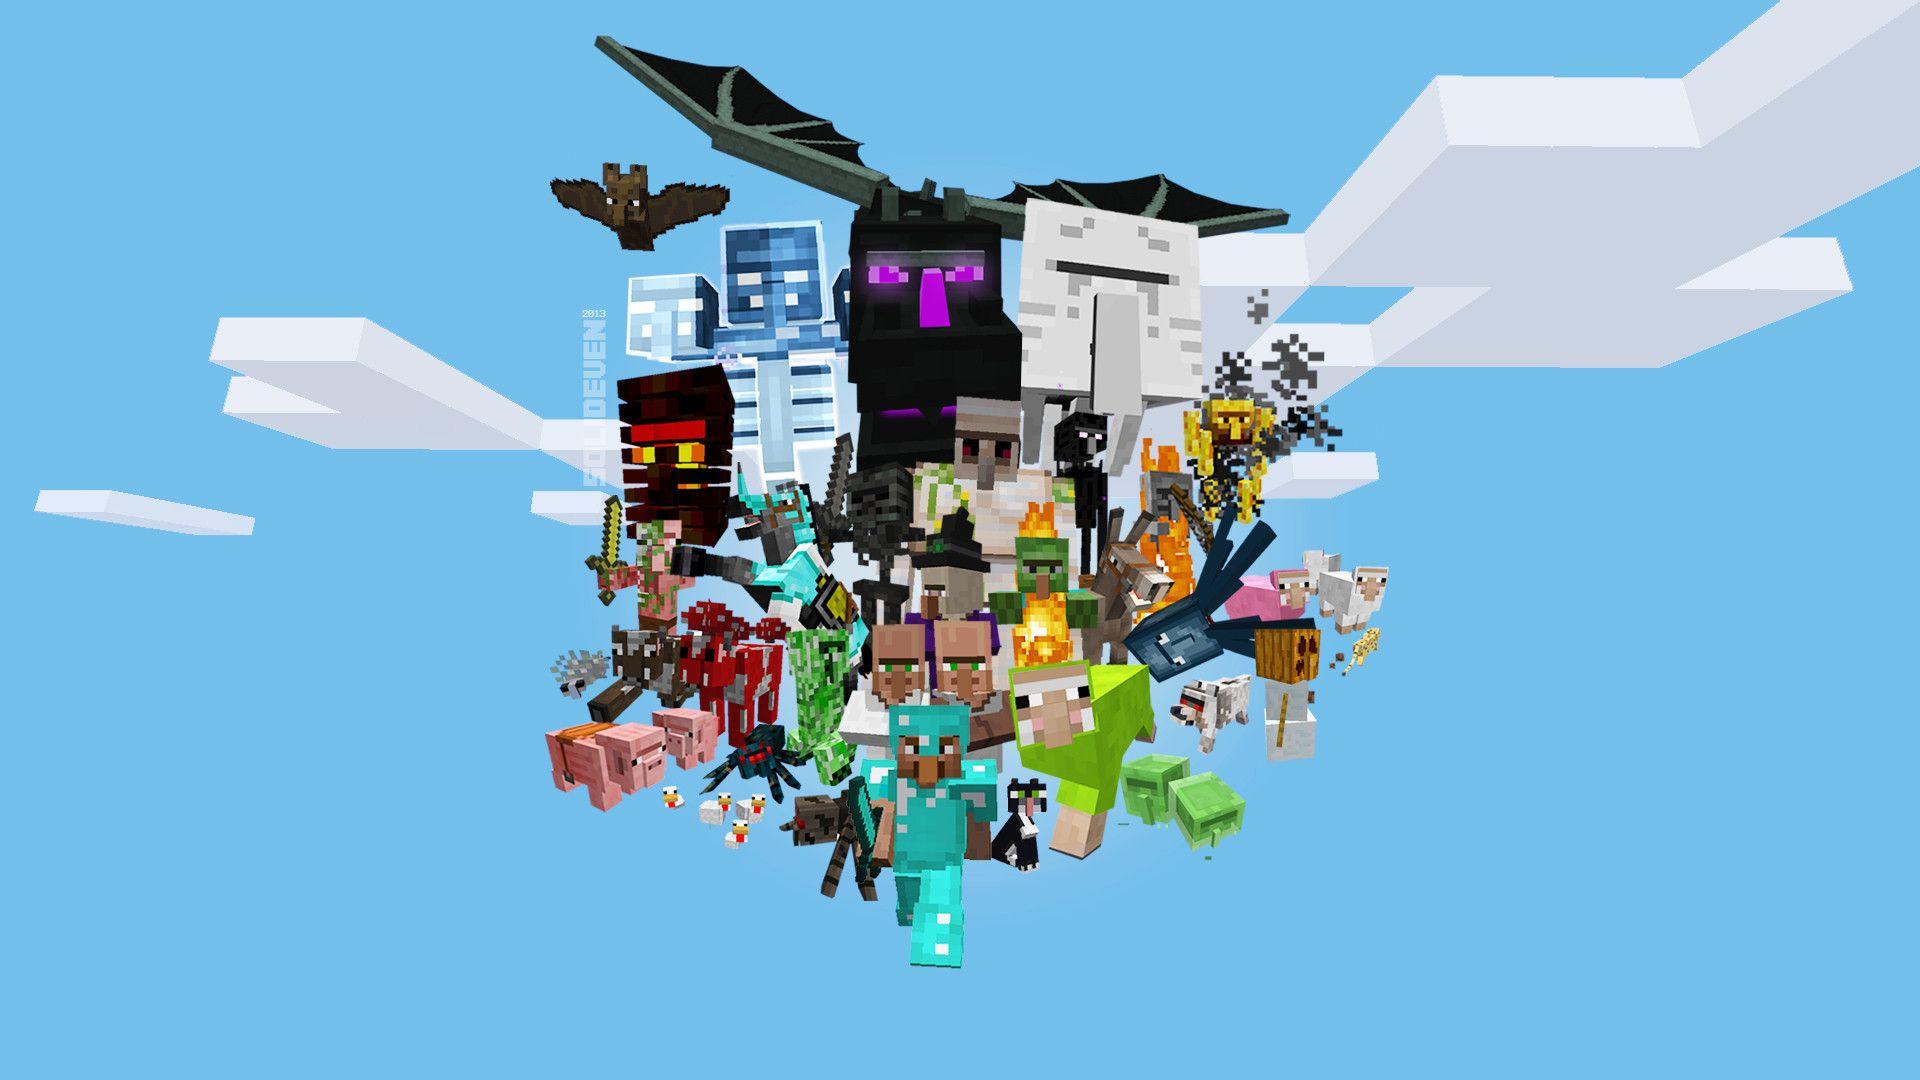 Amazing Wallpaper Minecraft Gamer - 64aa3e030a7d0412e079c993f6d0463f  Pic_137255.jpg